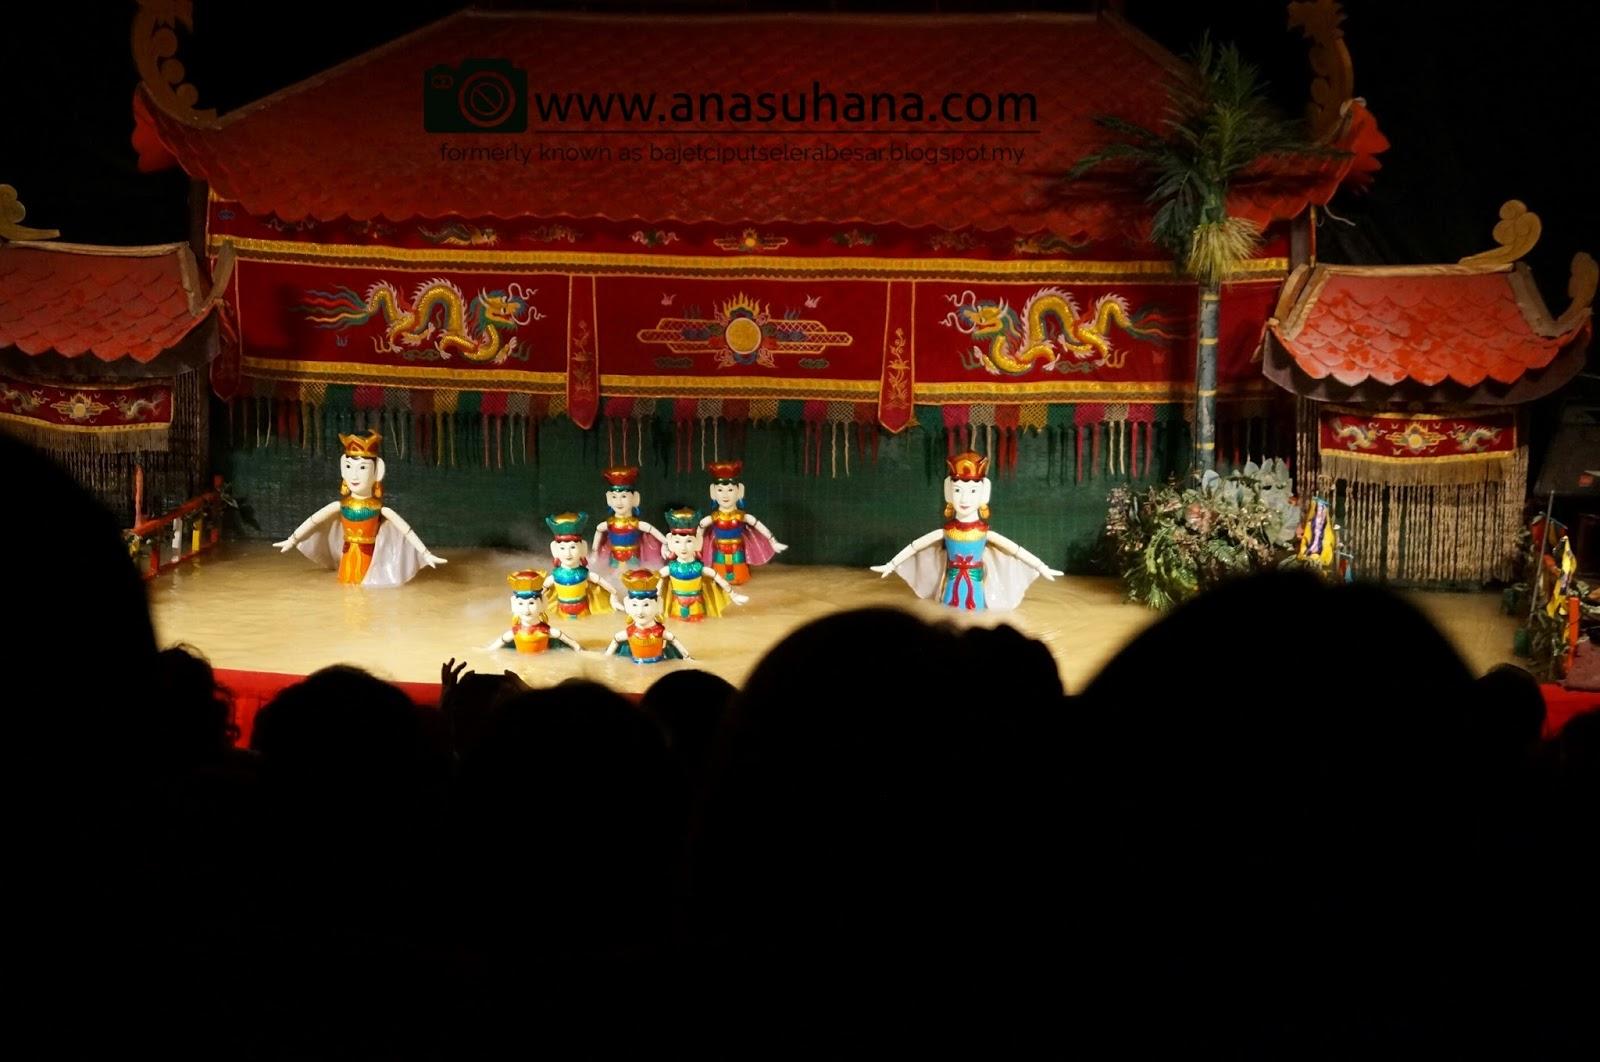 Tempat Menarik di Vietnam : Menyaksikan The Golden Dragon Water Puppet Theatre dan Menaiki Cruise Malam di Sungai Saigon